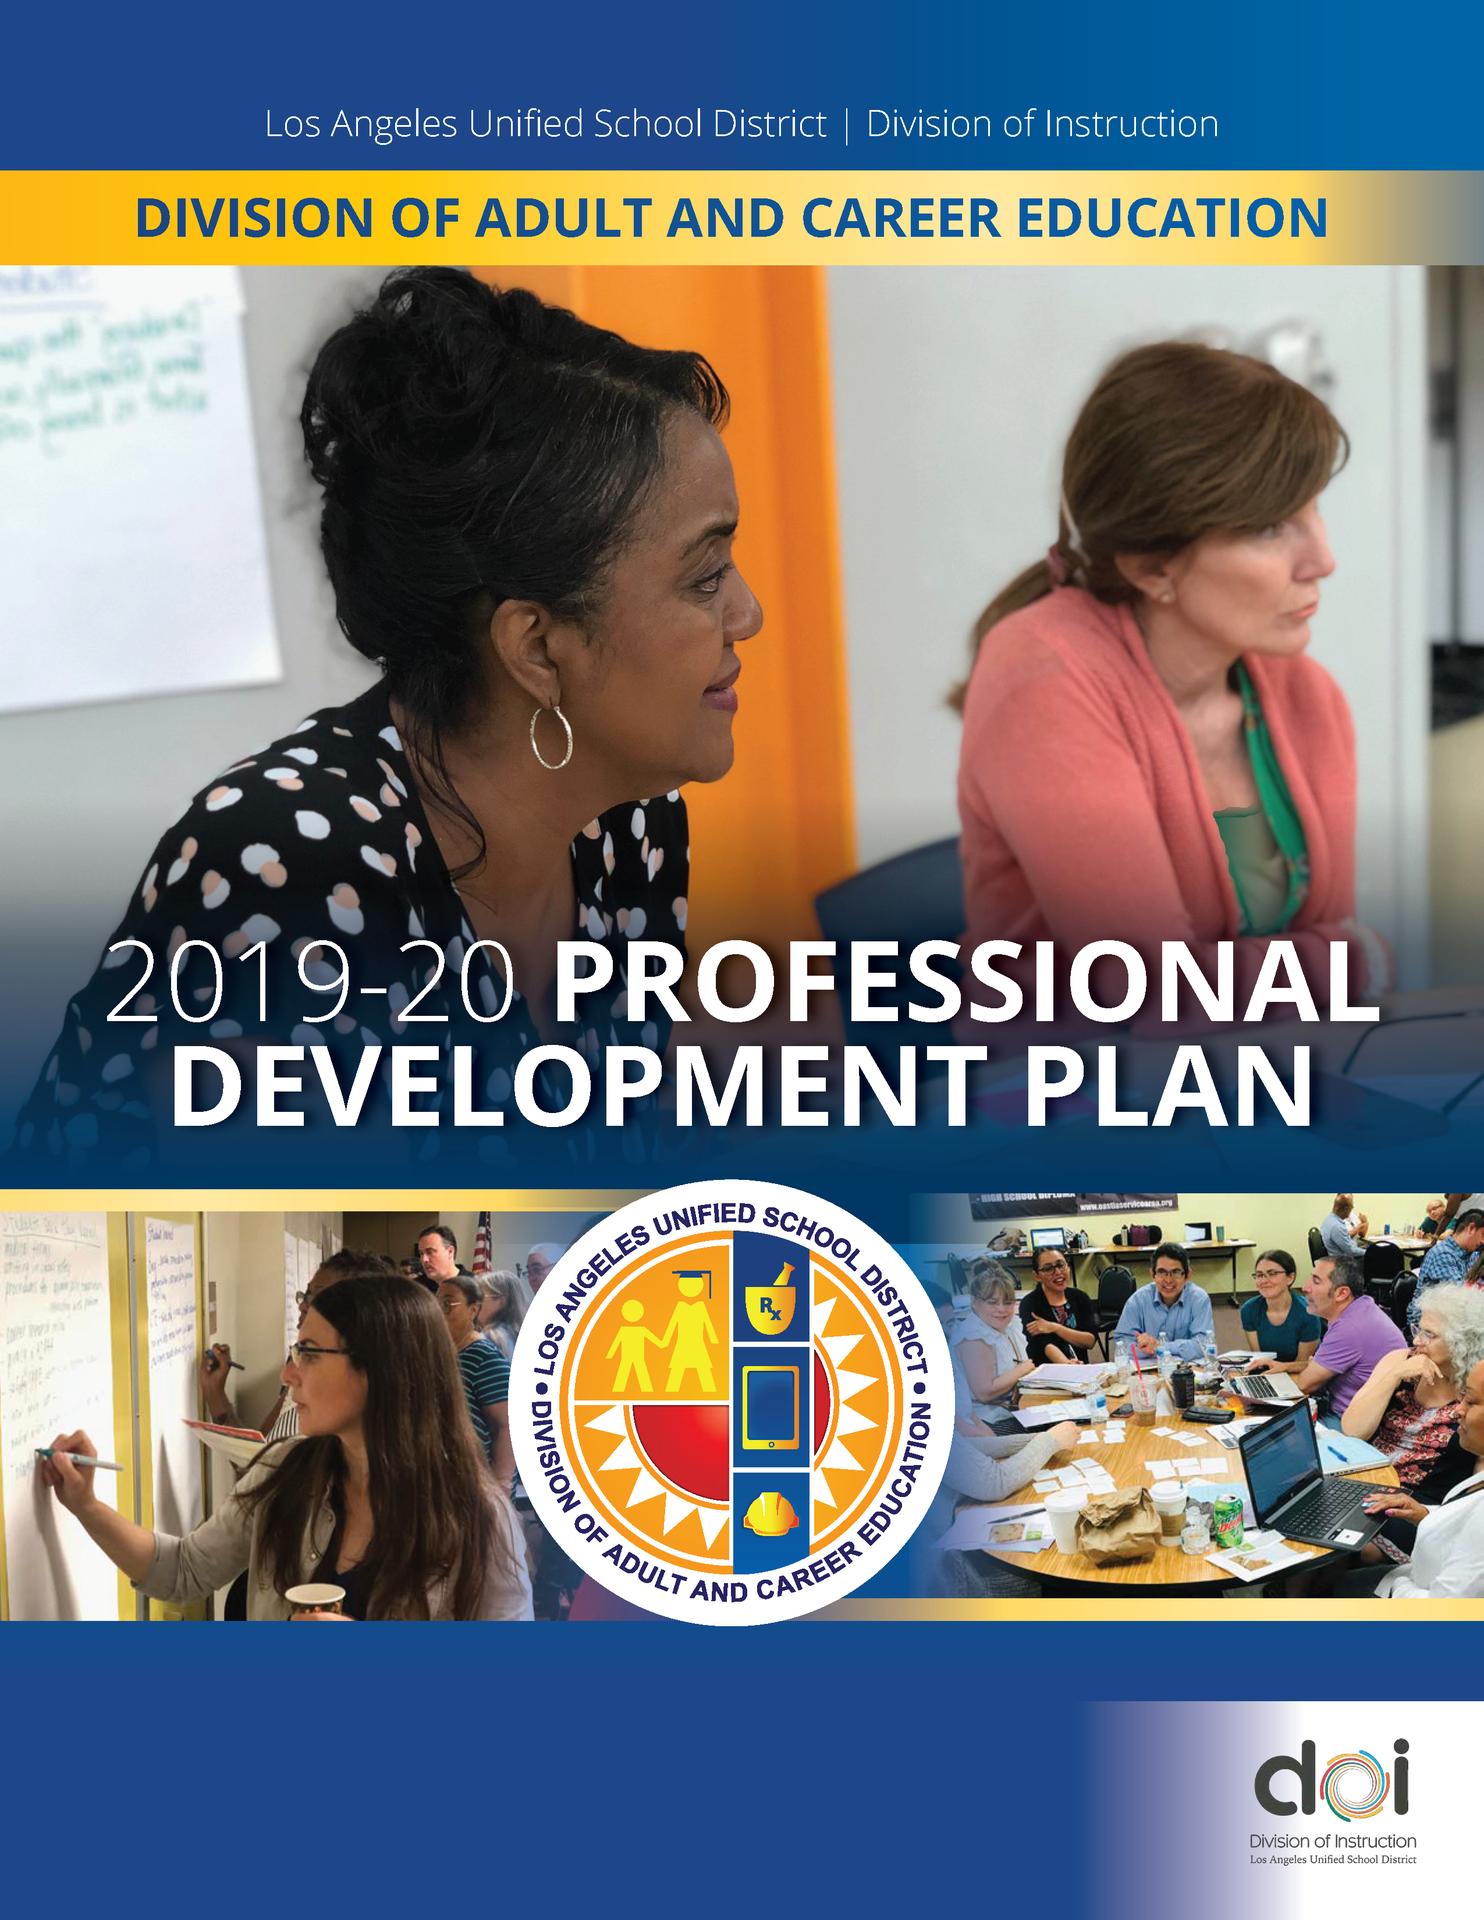 2019-2020 Professional Development Plan